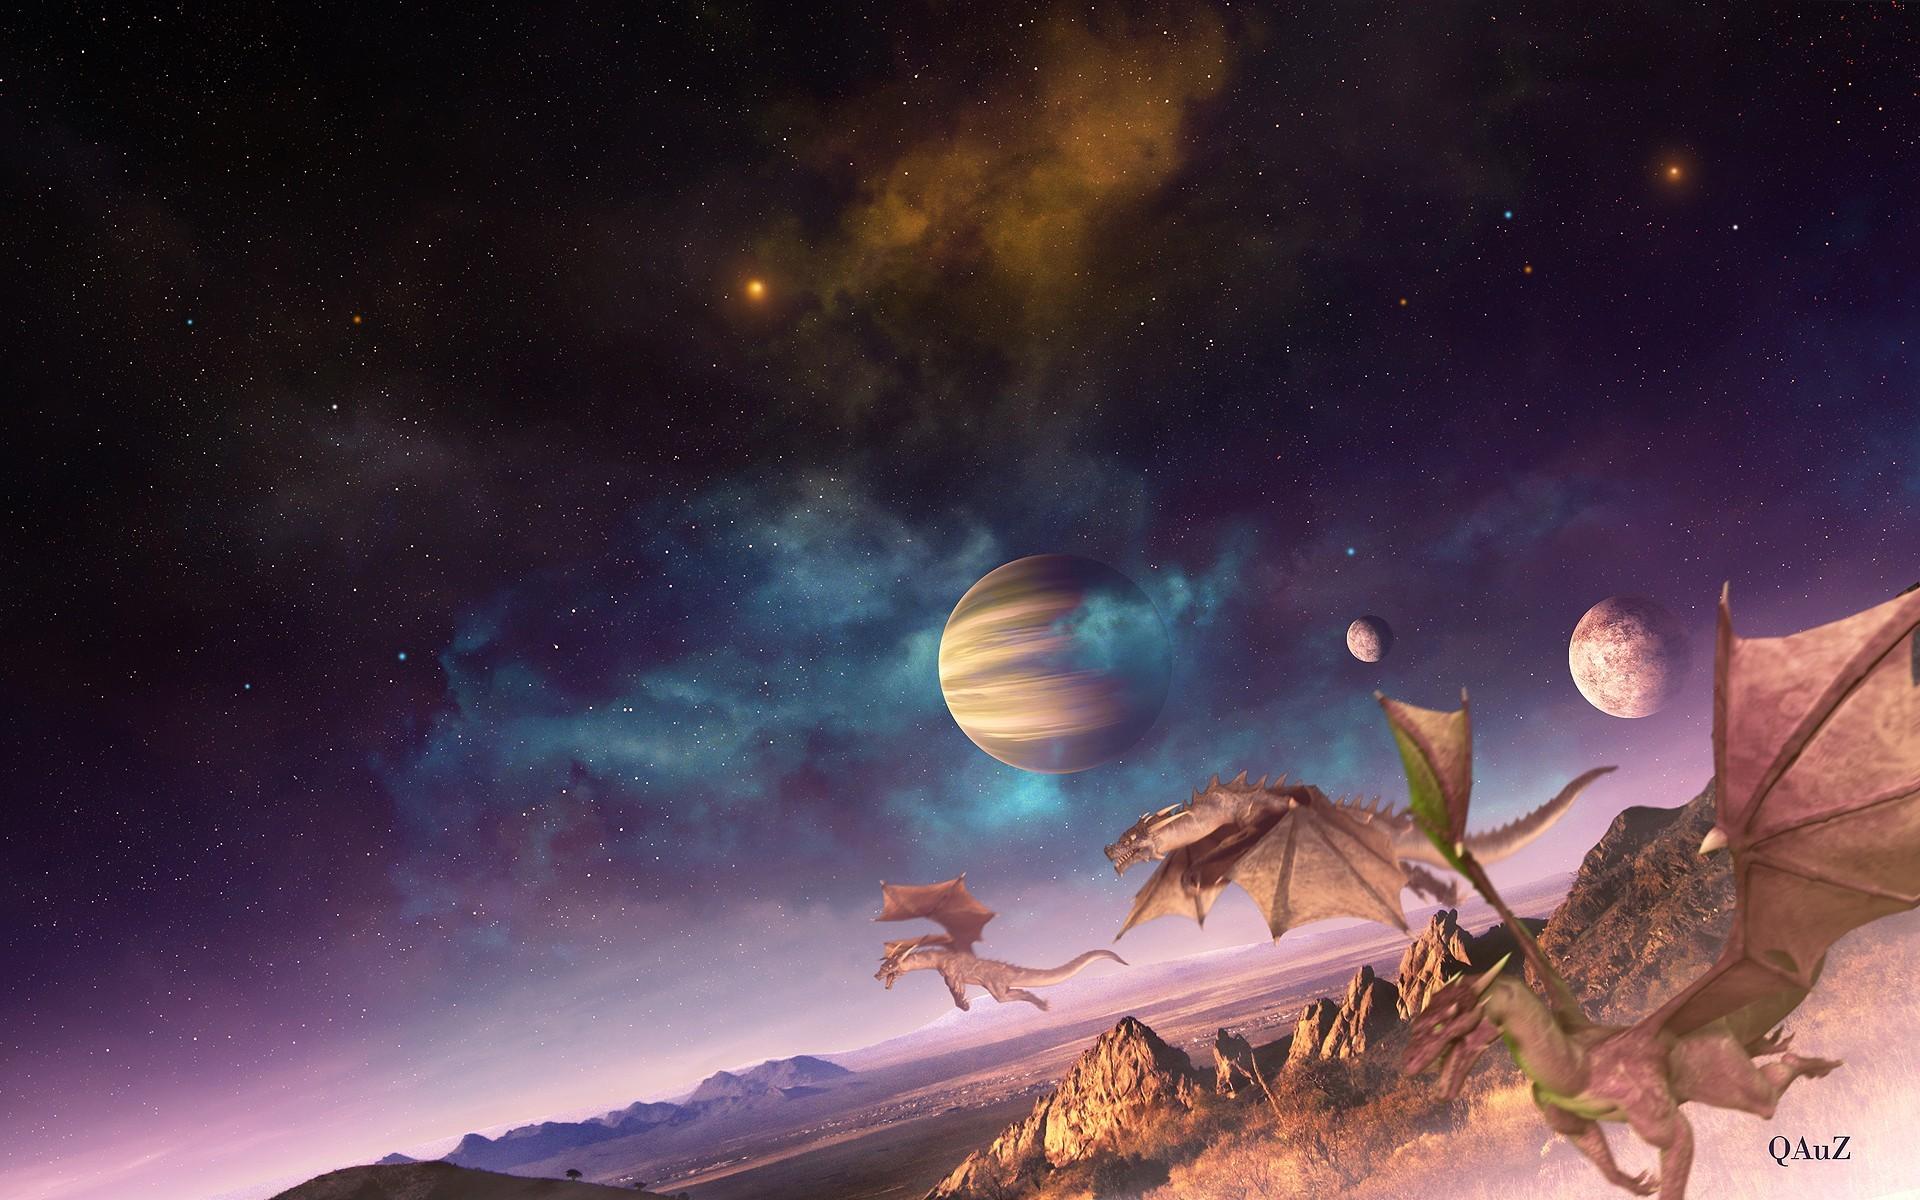 Outer space fantasy art digital art creatures dragons fantasy planets  landscapes wallpaper | | 58929 | WallpaperUP